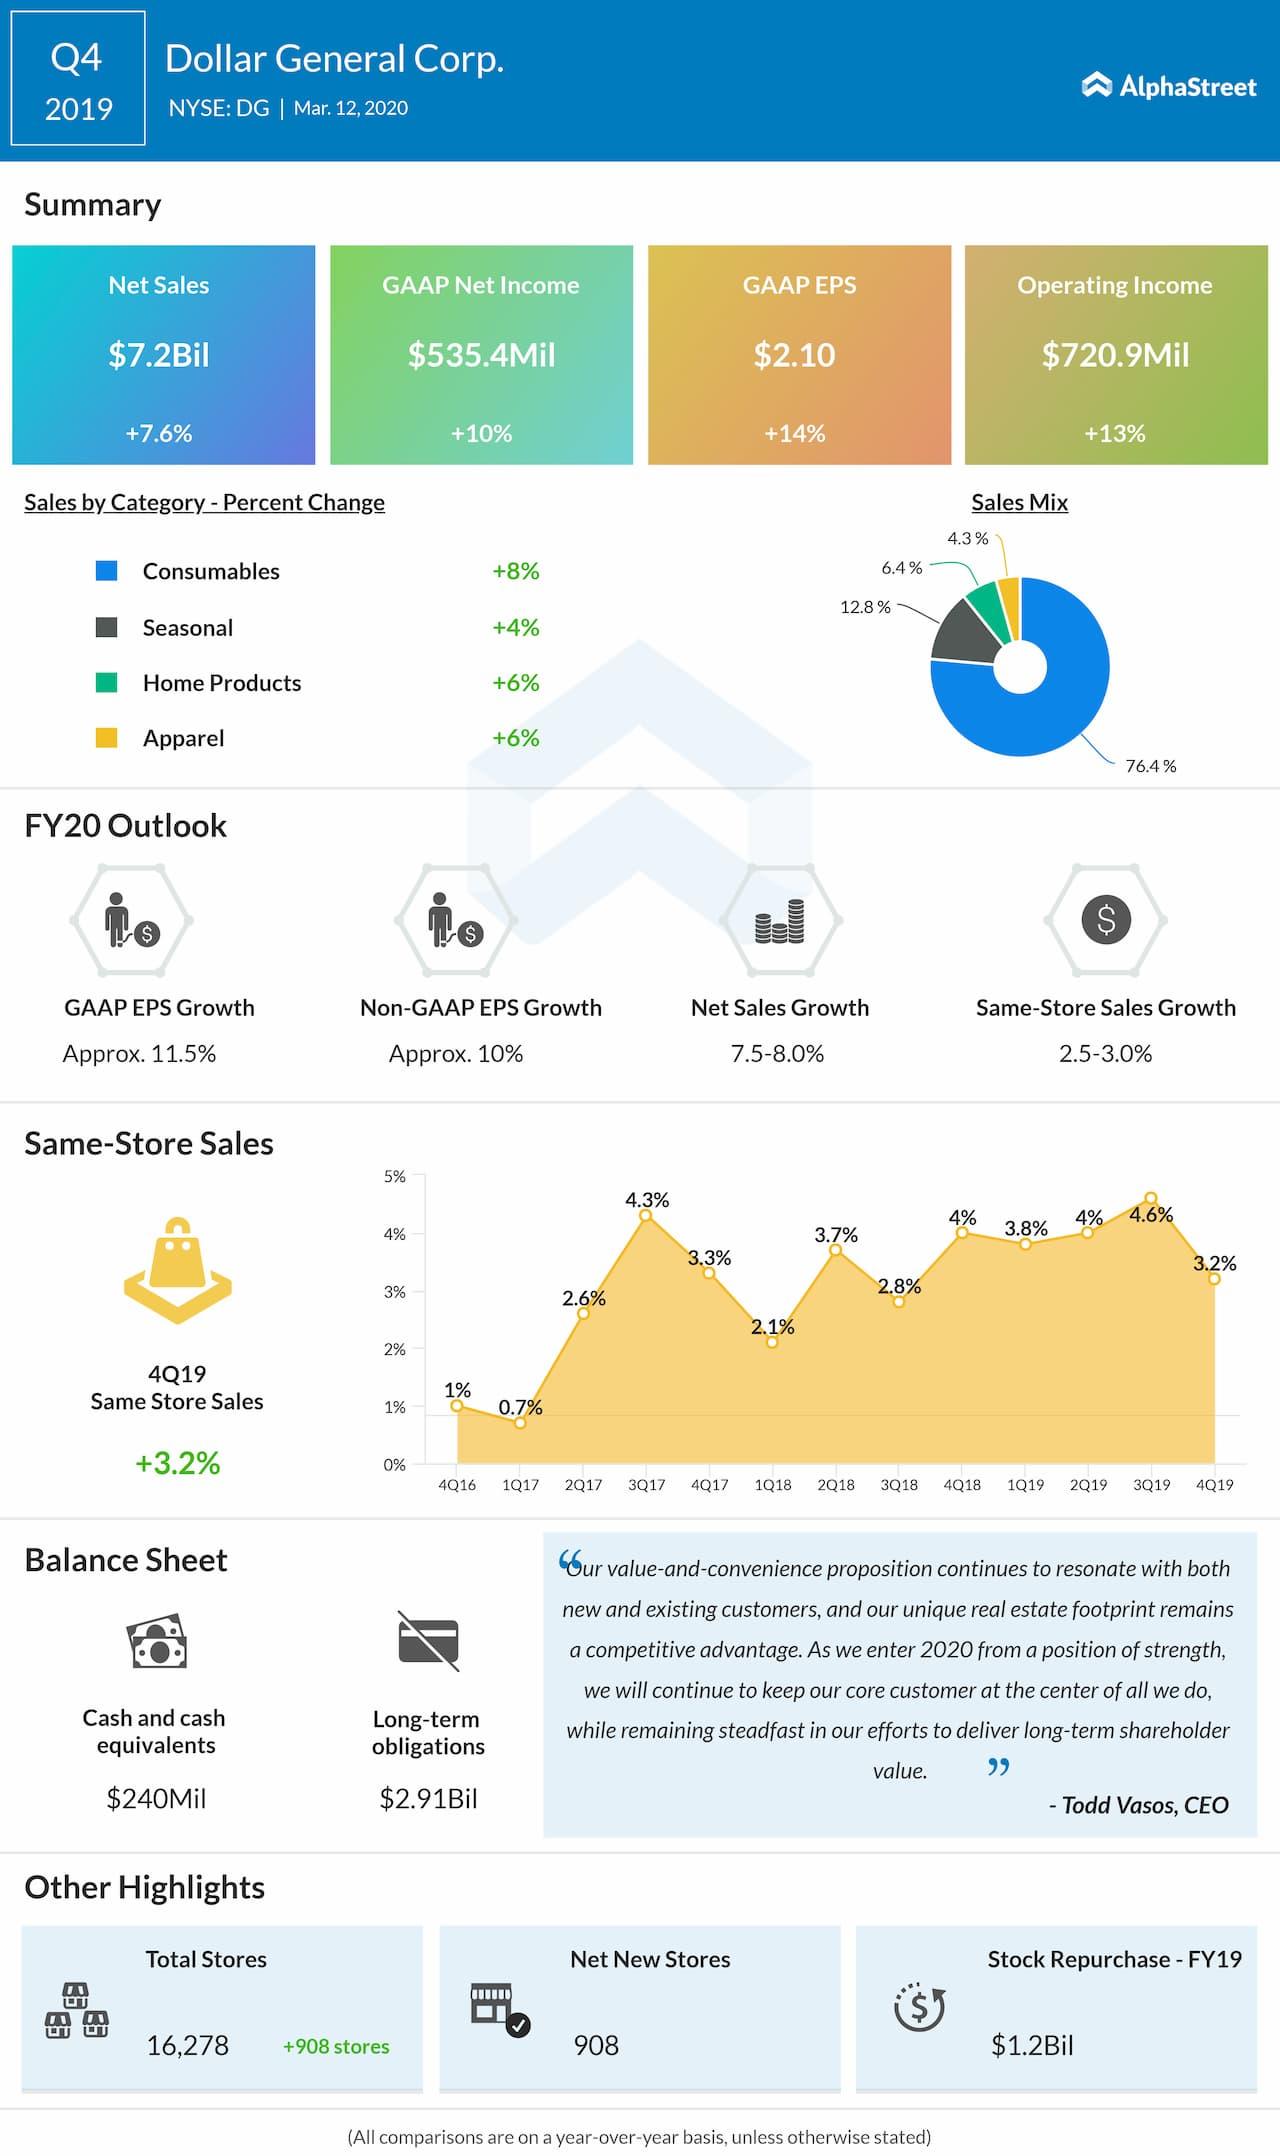 Dollar General beats Q4 2019 revenue and earnings estimates